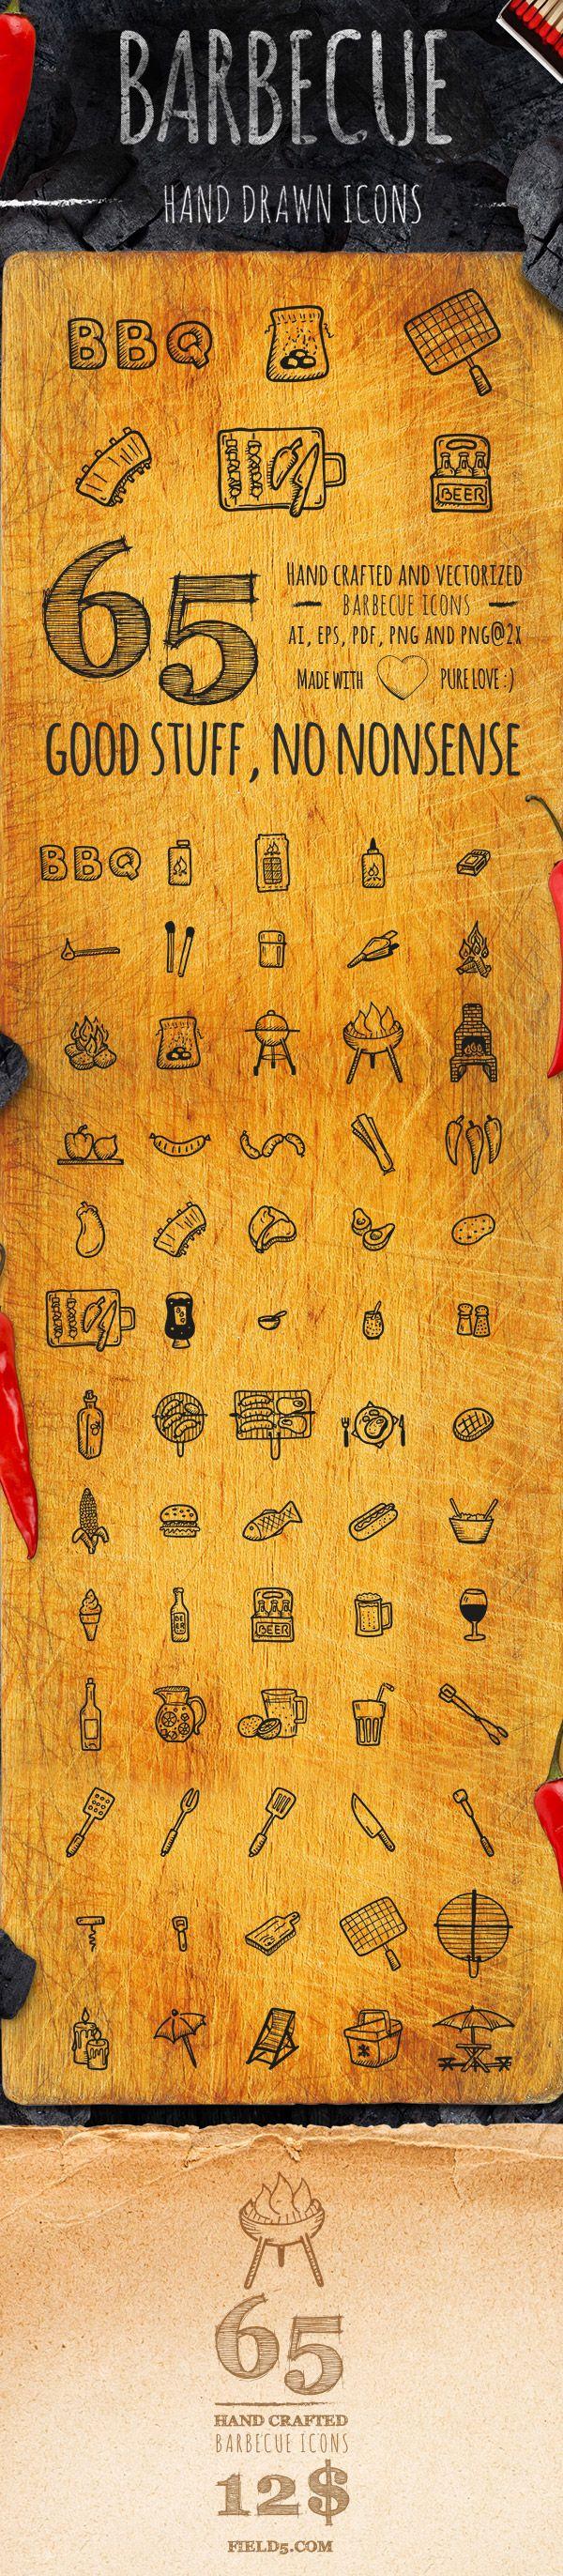 BBQ - 65 Hand-drawn icons by Agata Kuczmińska, via Behance